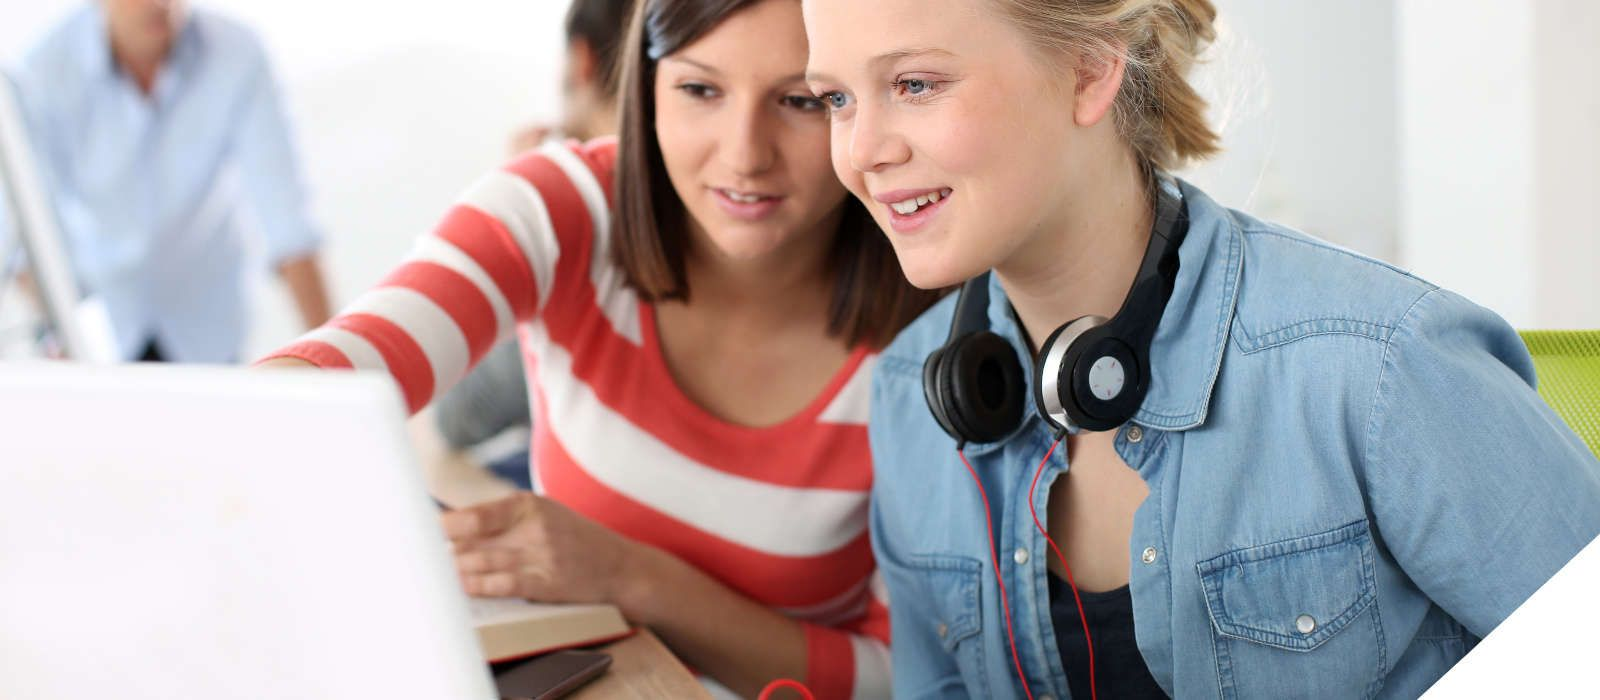 Yurtdisi Askerlik Tecil Islemleri With Images Computer Basics Computer Programming Learn Computer Science